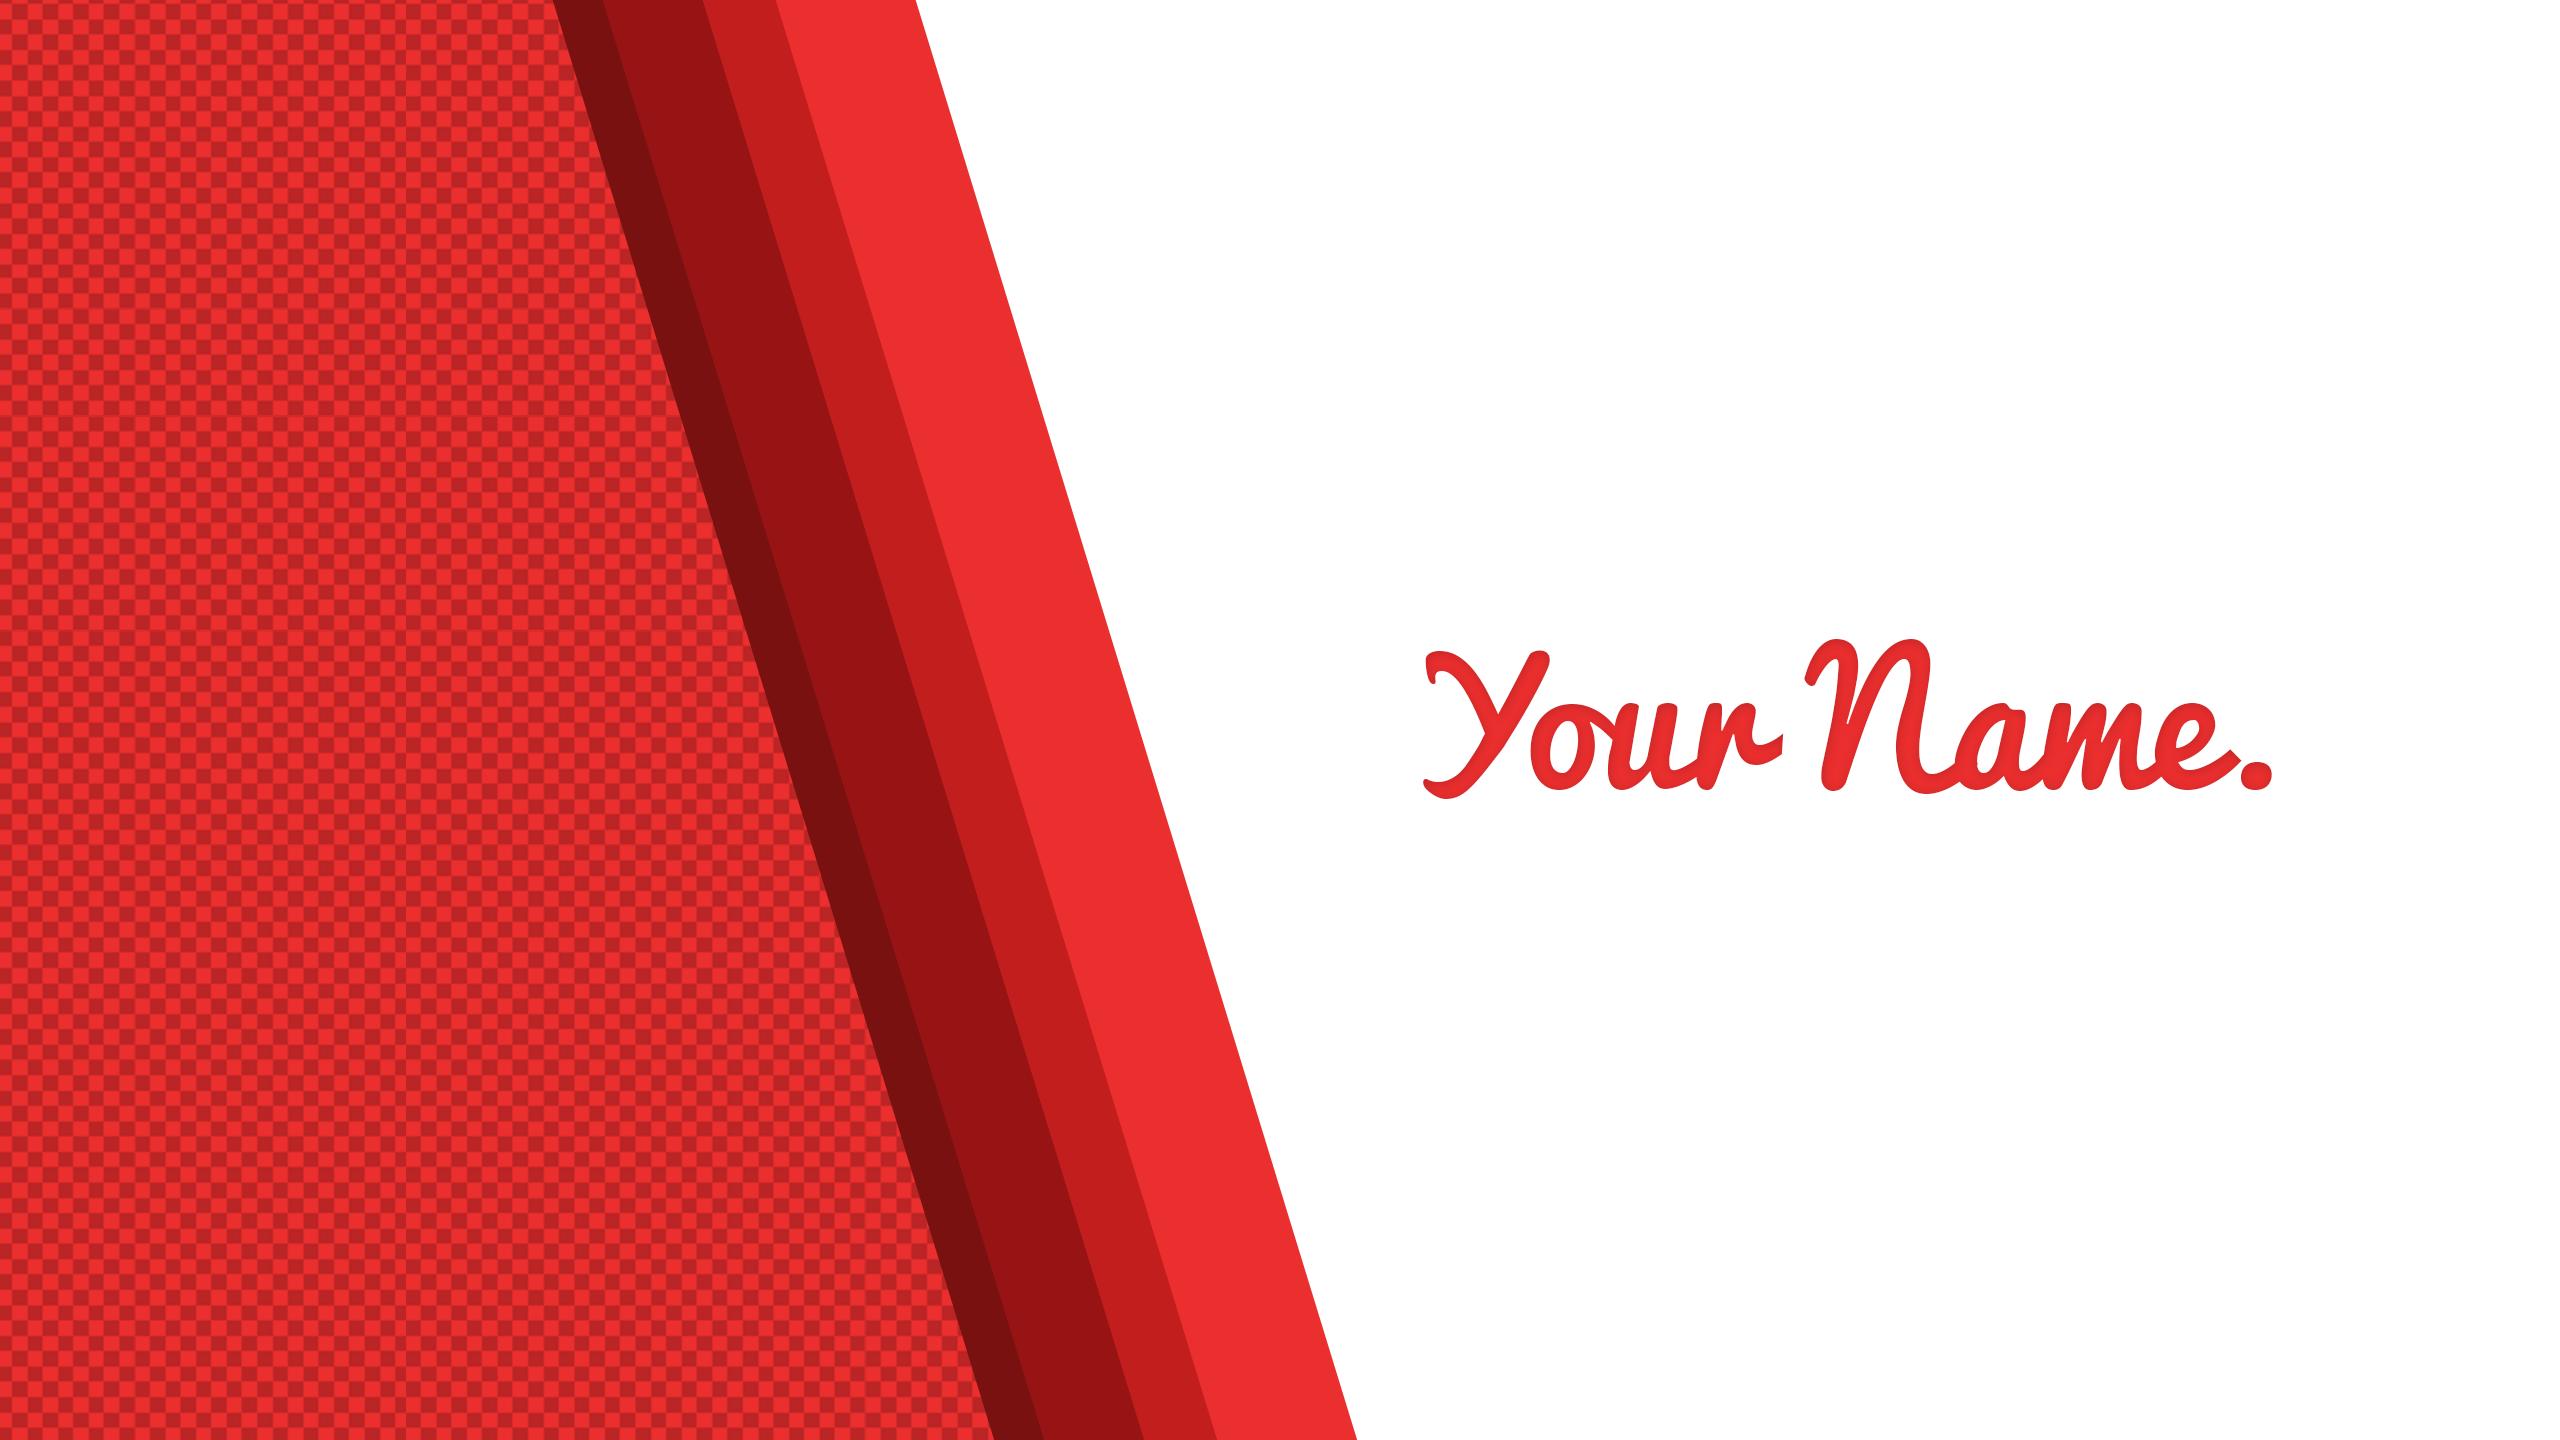 Red Gradient Banner